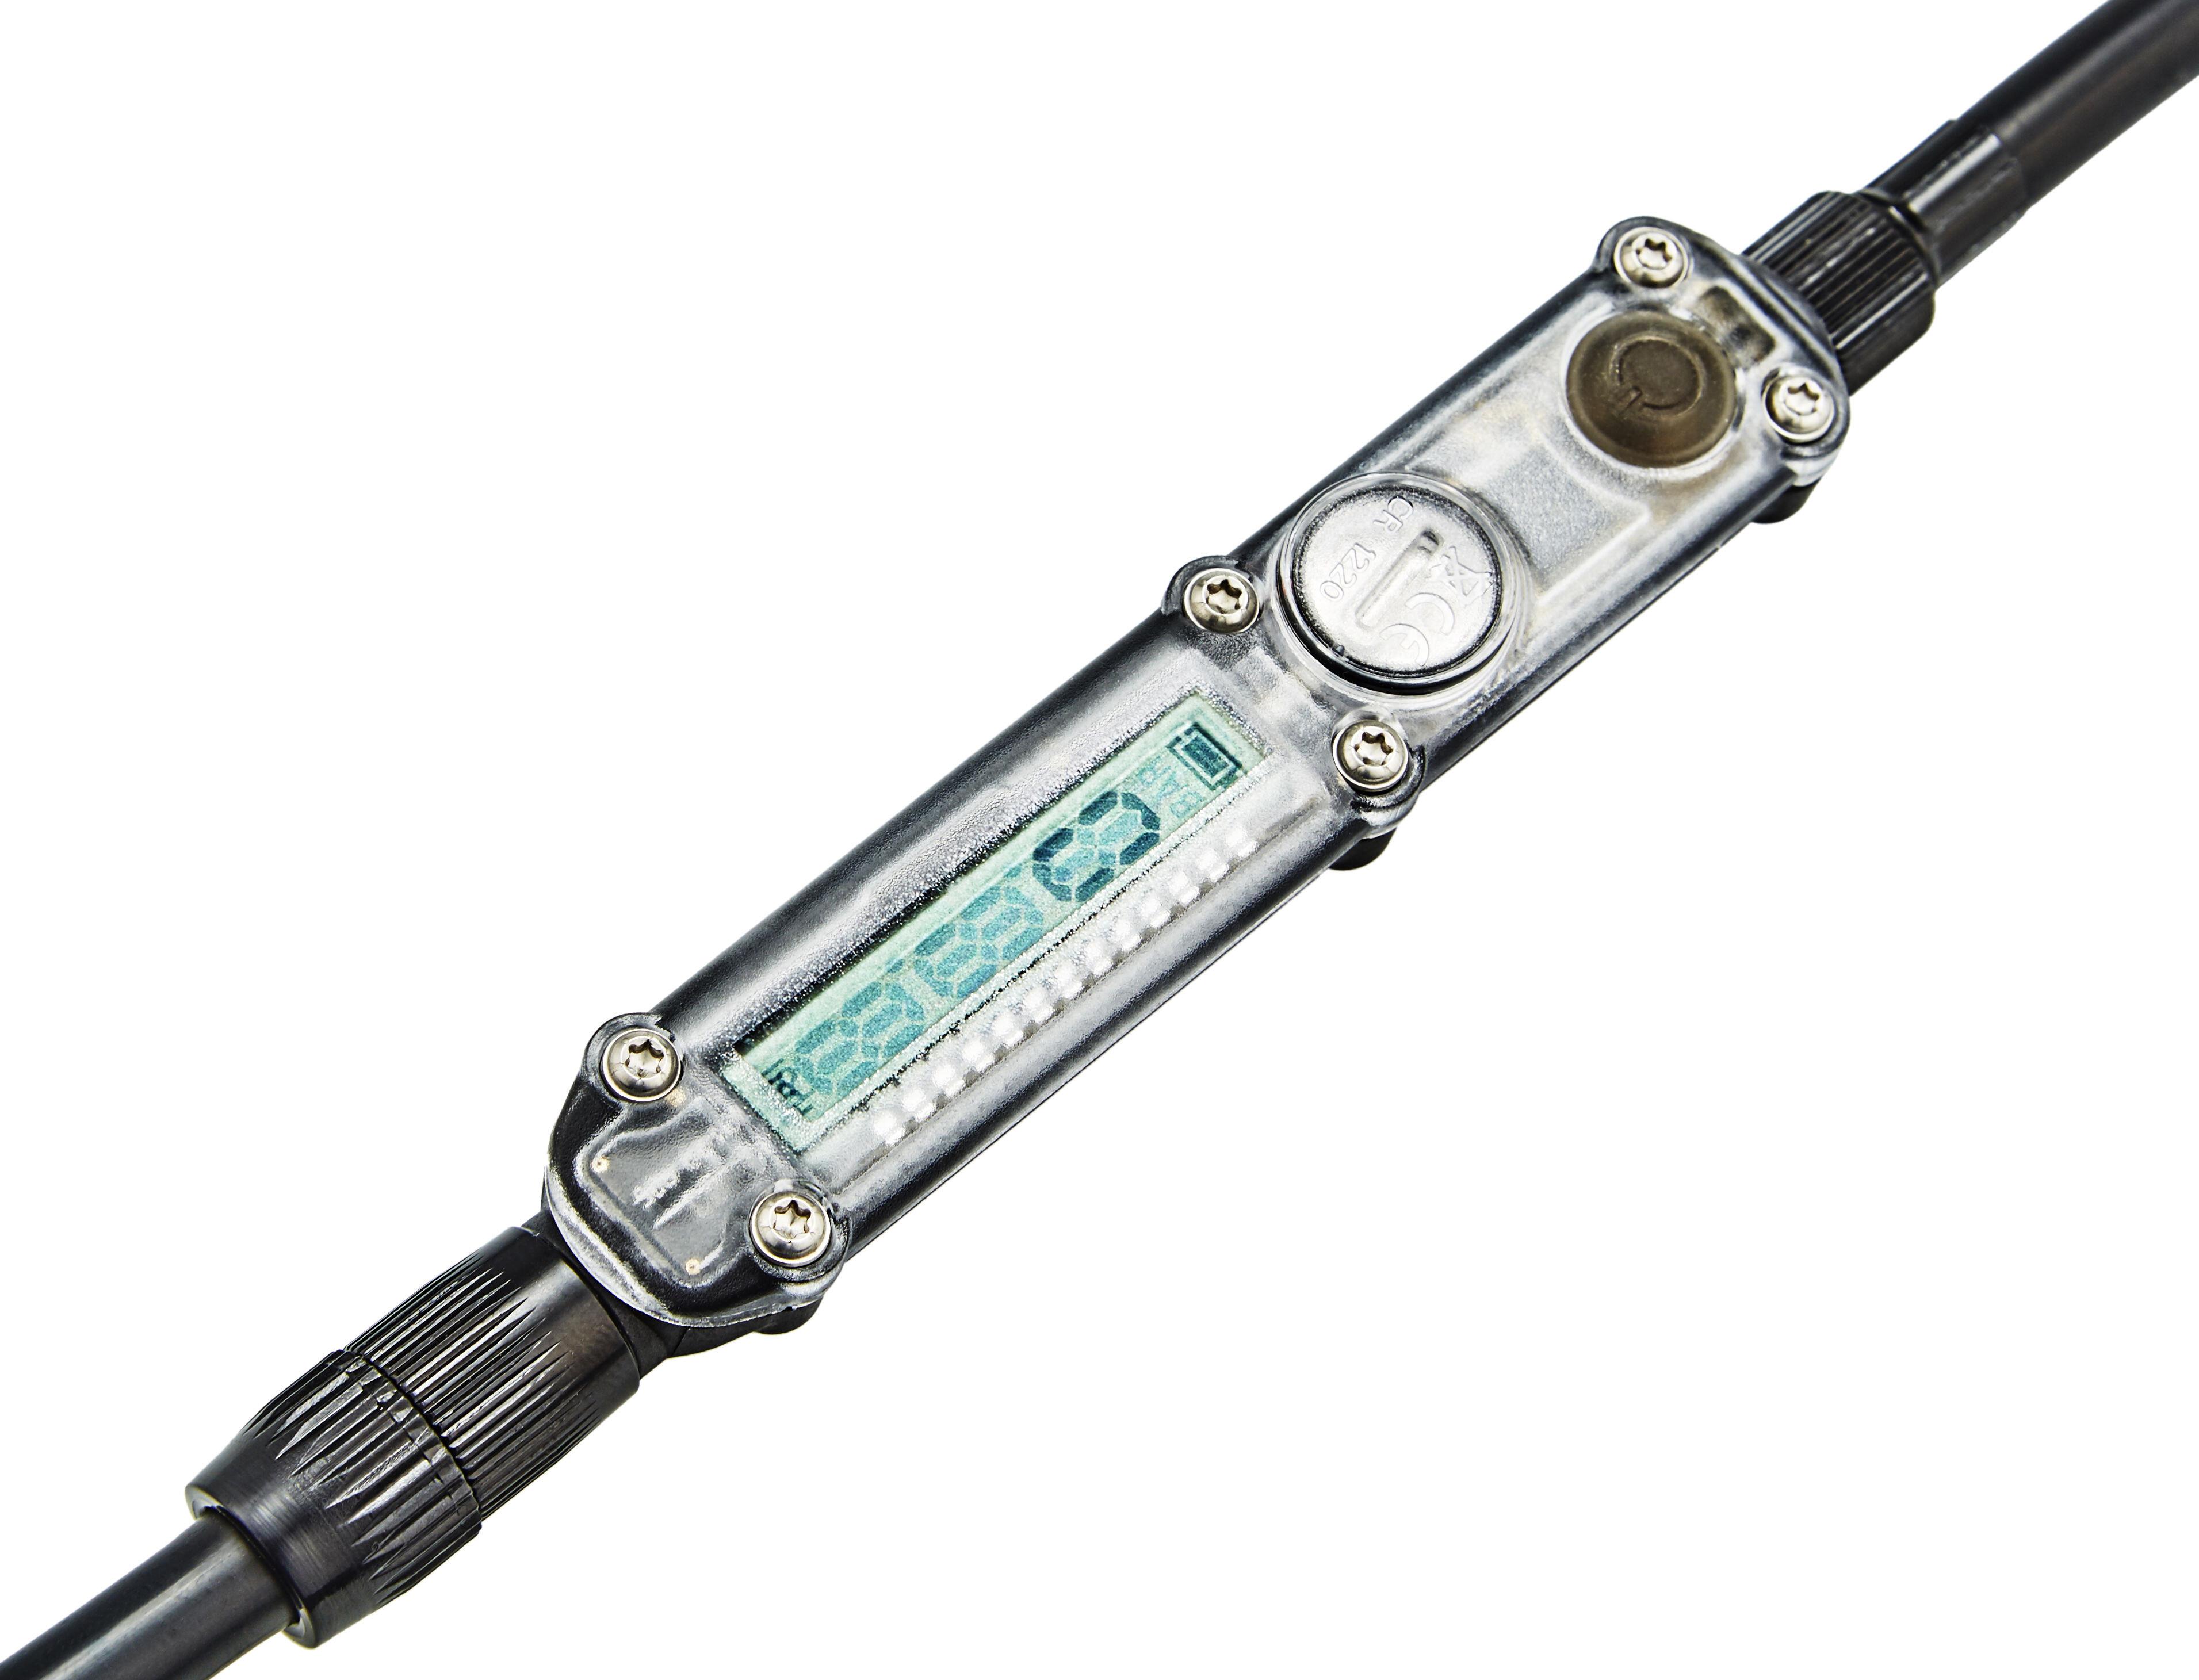 Lezyne Cnc Micro Floor Drive Digital Hpg Mini Pump Glossy